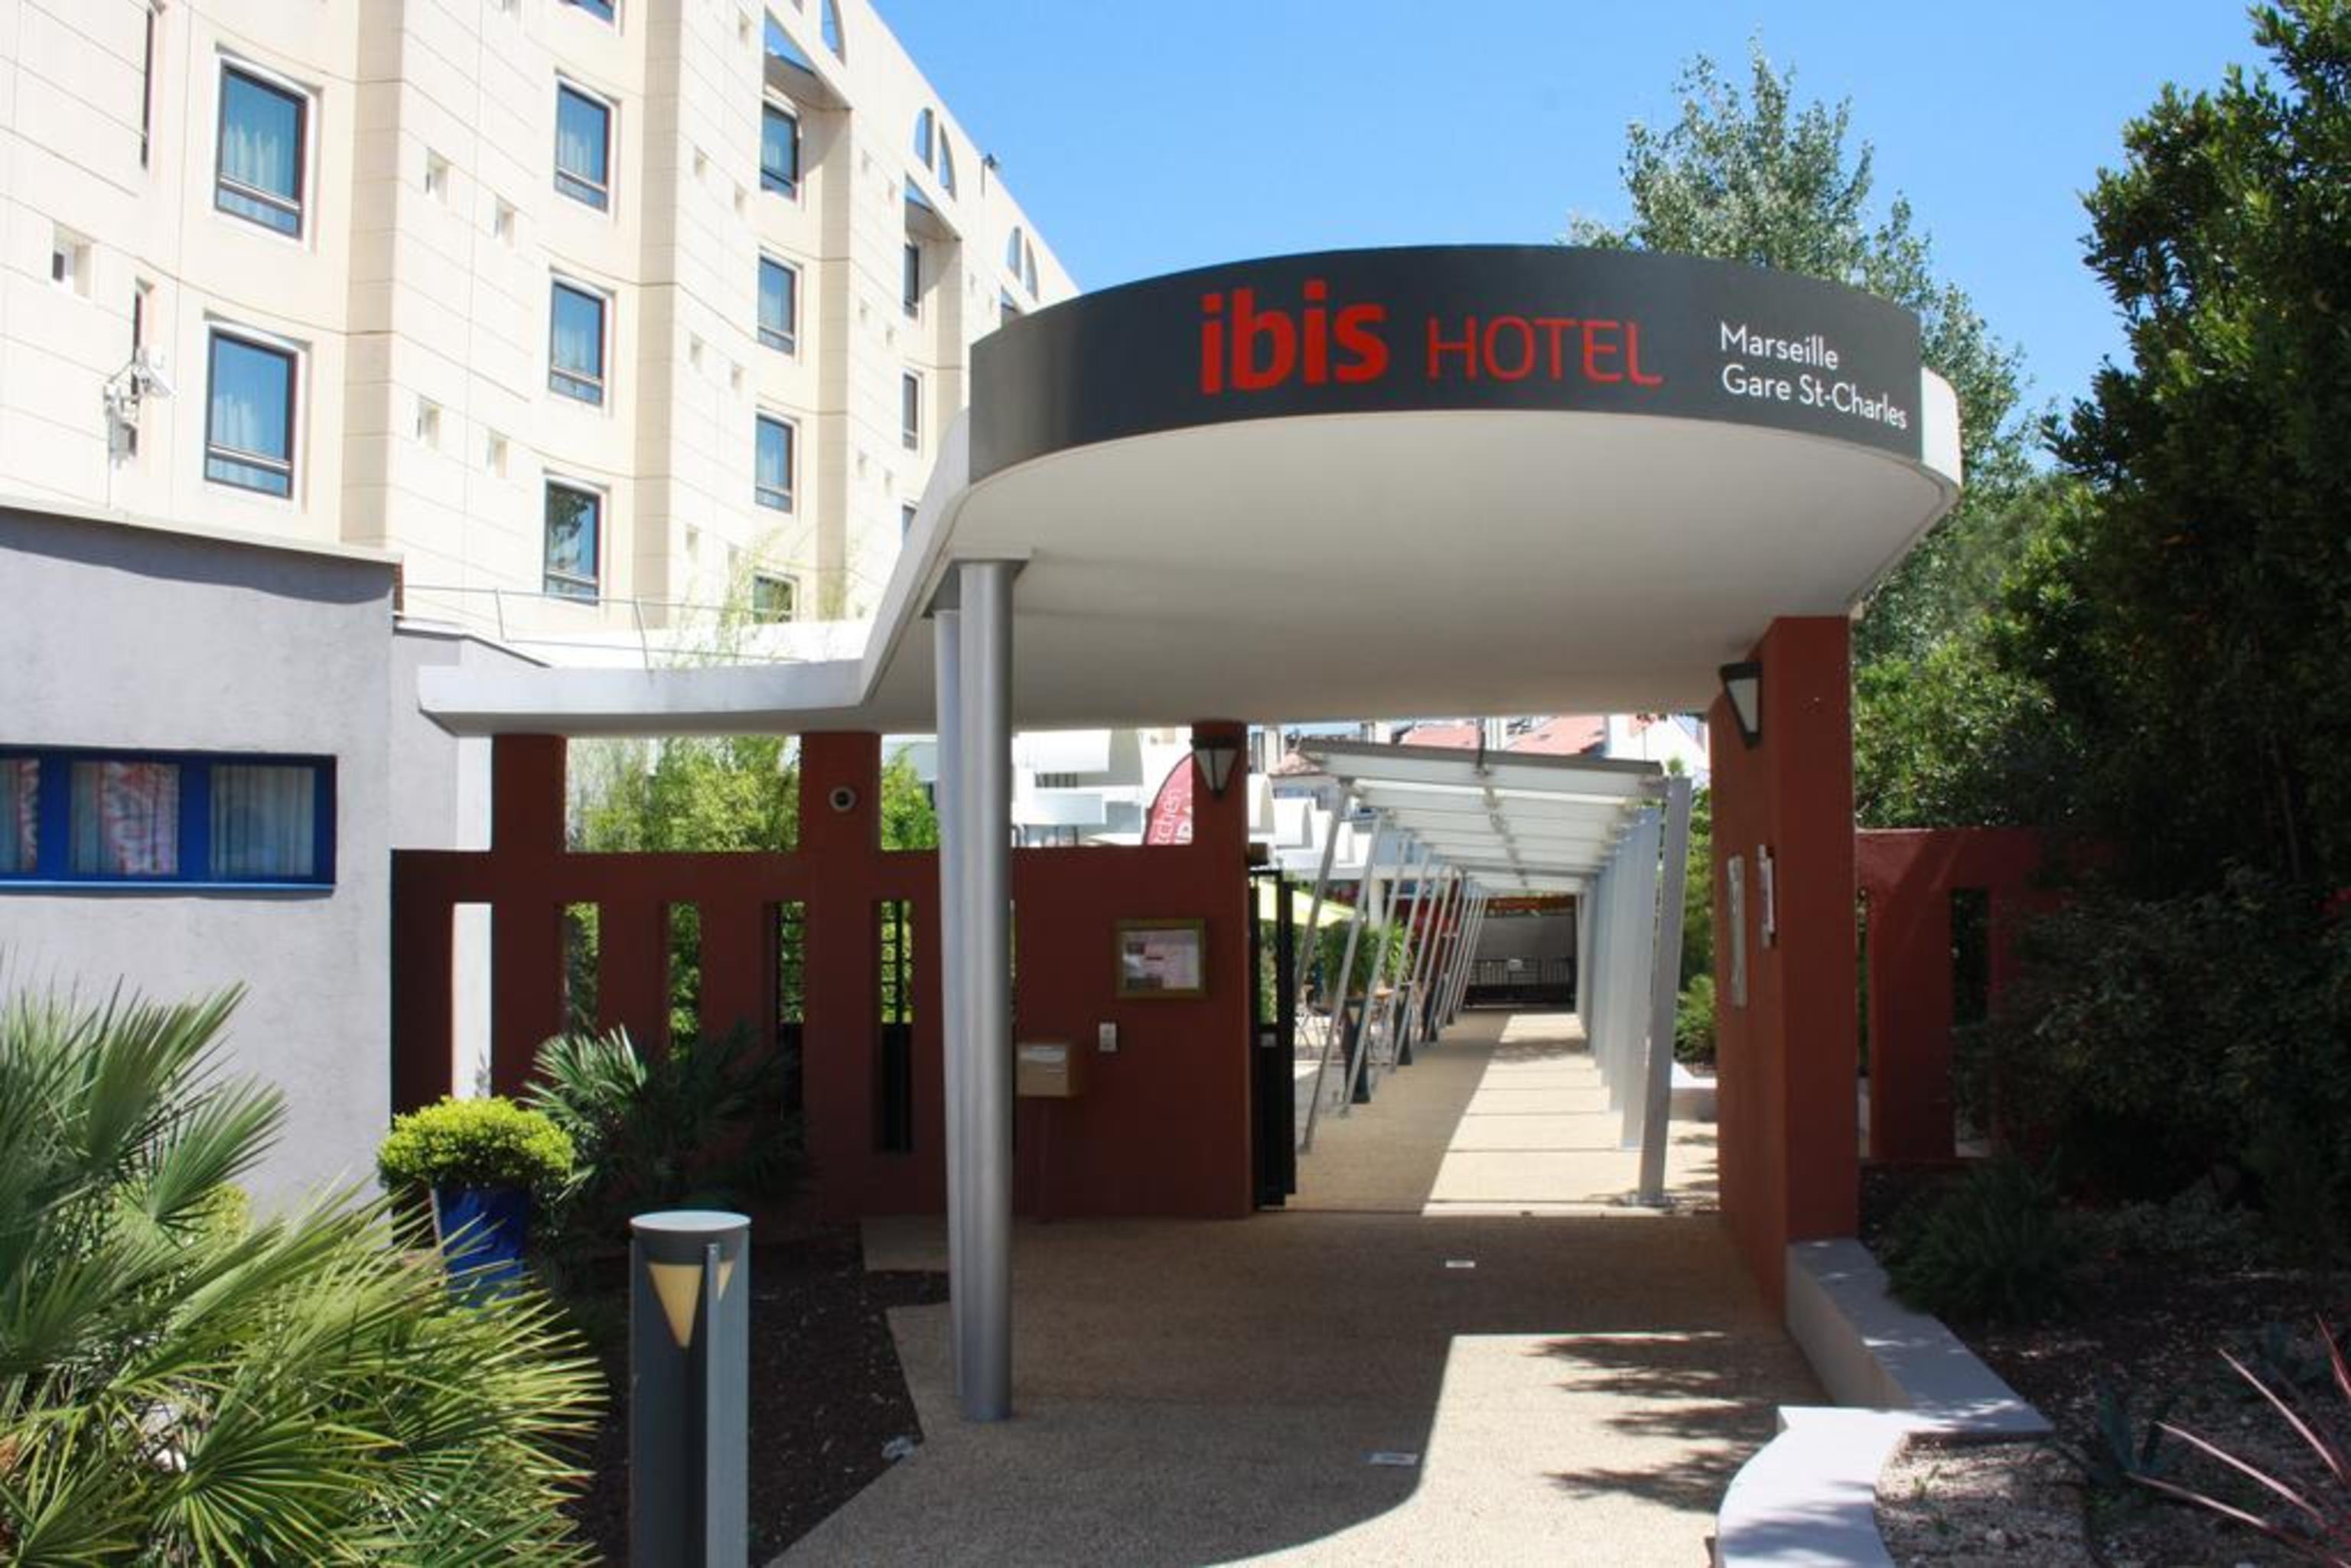 Ibis Styles Marseille Gare Saint Charles, Bouches-du-Rhône